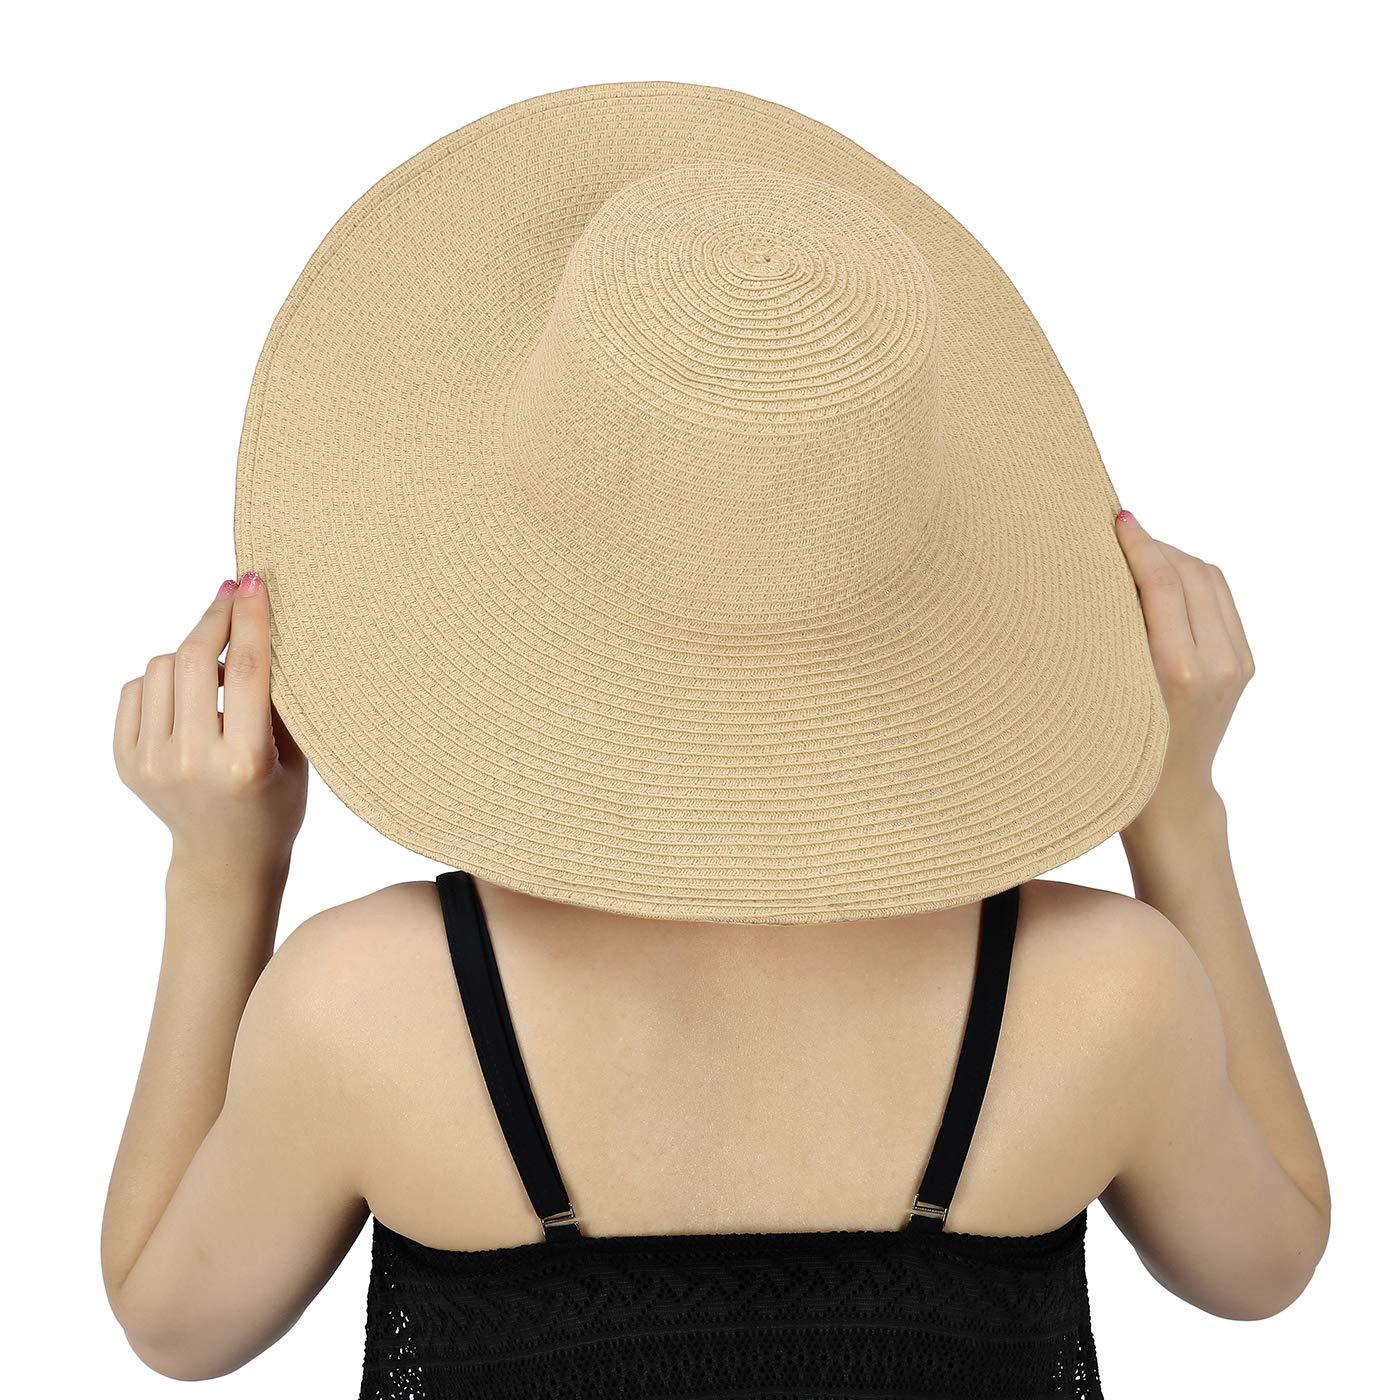 HDE Tan Sun Hat for Women Tan Straw Beach Hat Tan Derby Hats Cap 50+ UPF at  Amazon Women s Clothing store  7eee9f2cbf0c